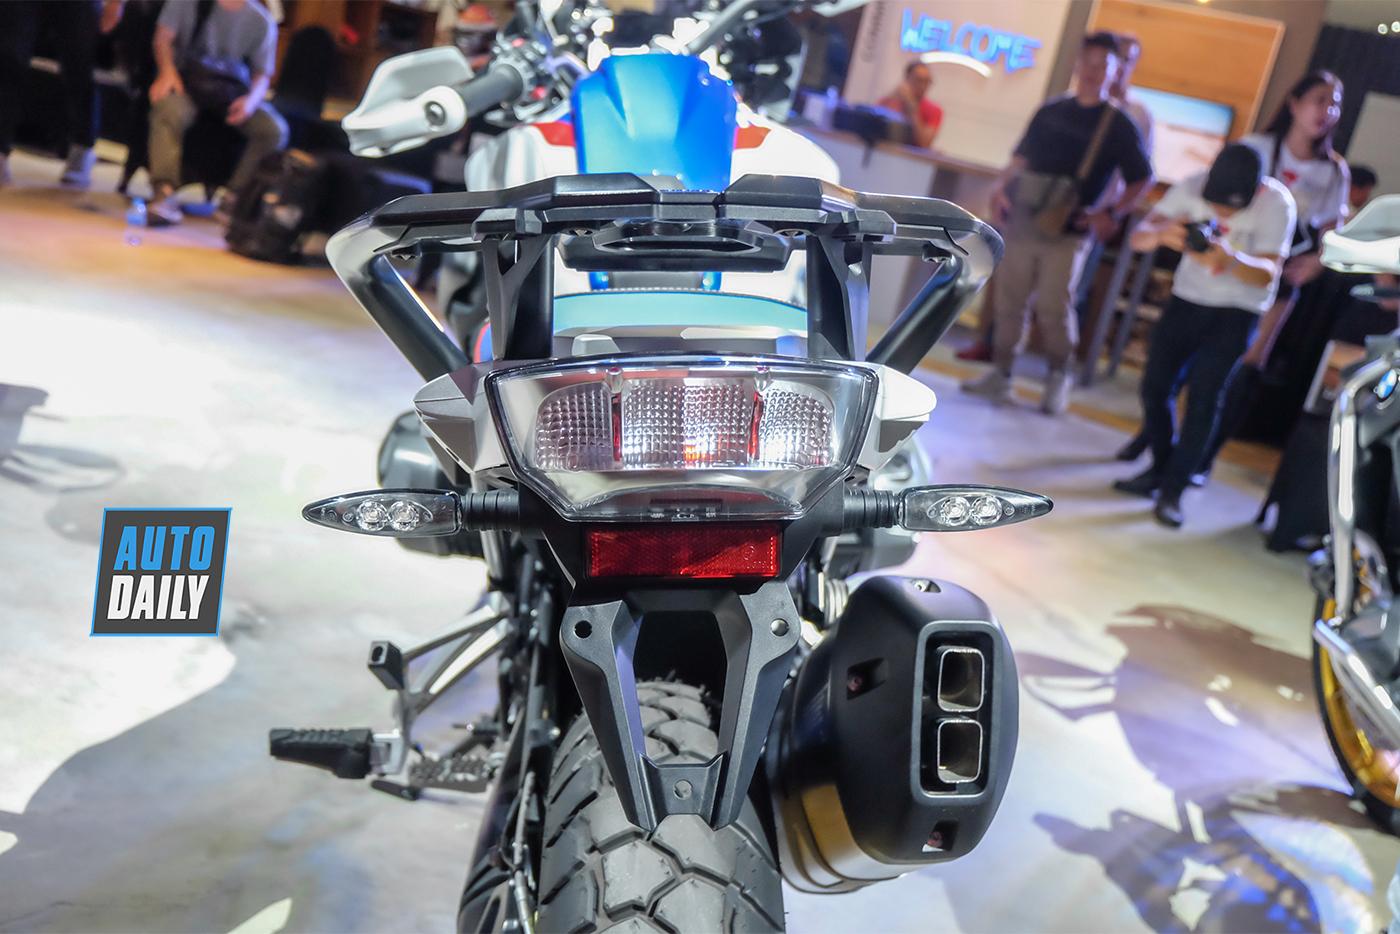 bmw-motorrad-r-1250-gs-2019-16.jpg